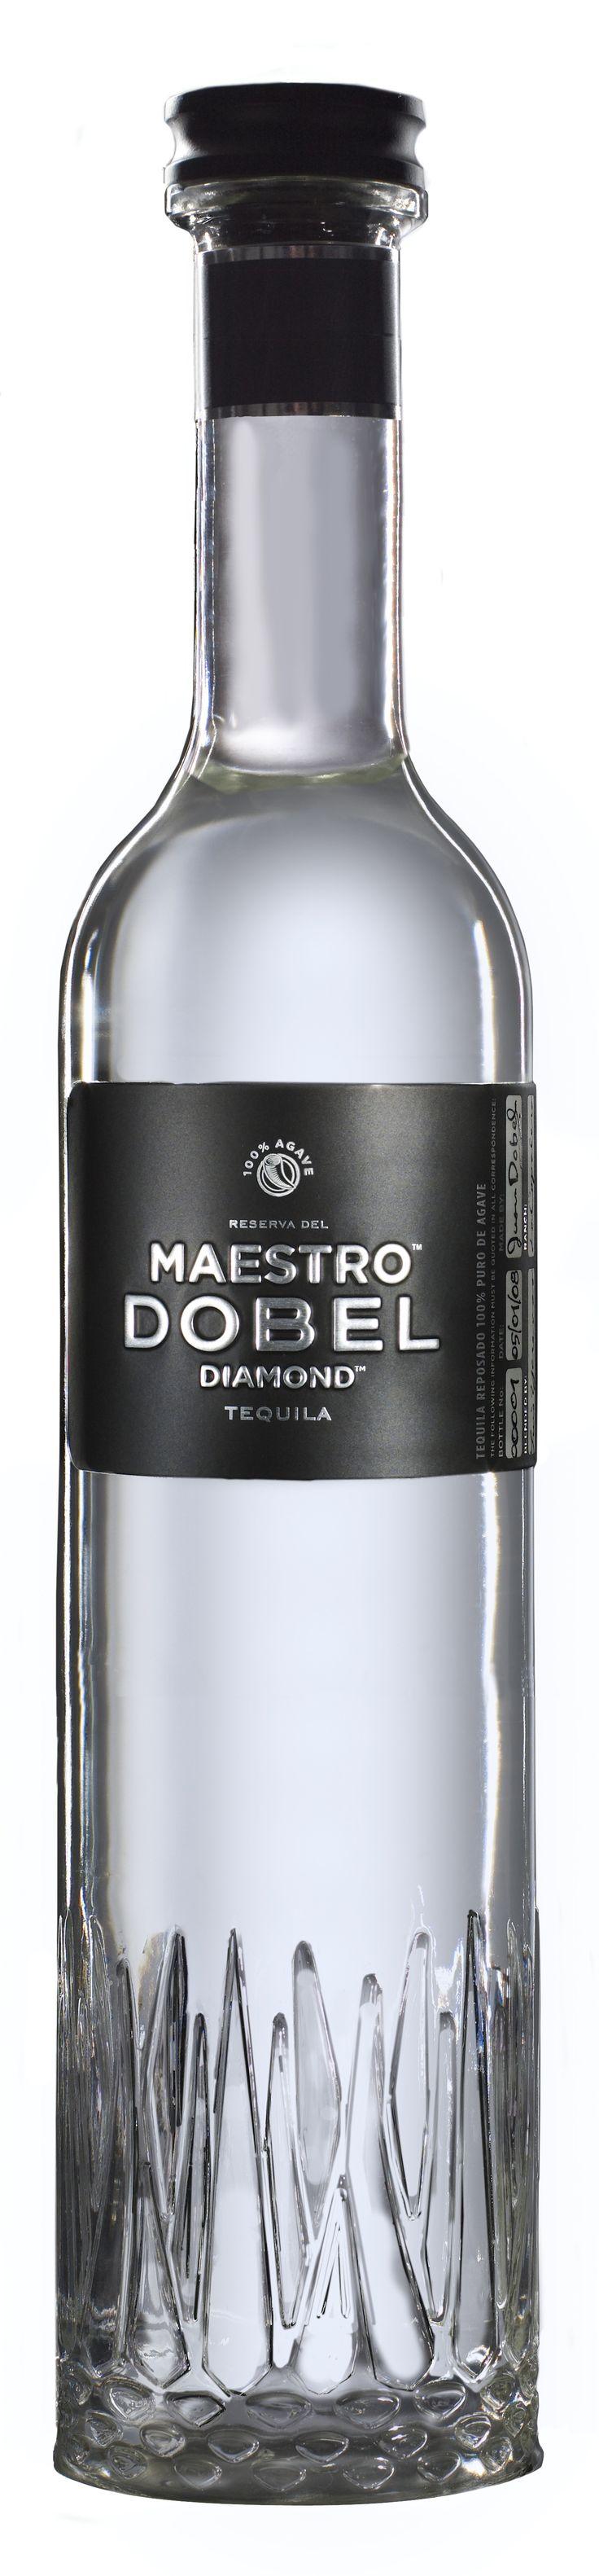 Maestro Dobel - Diamond Tequila